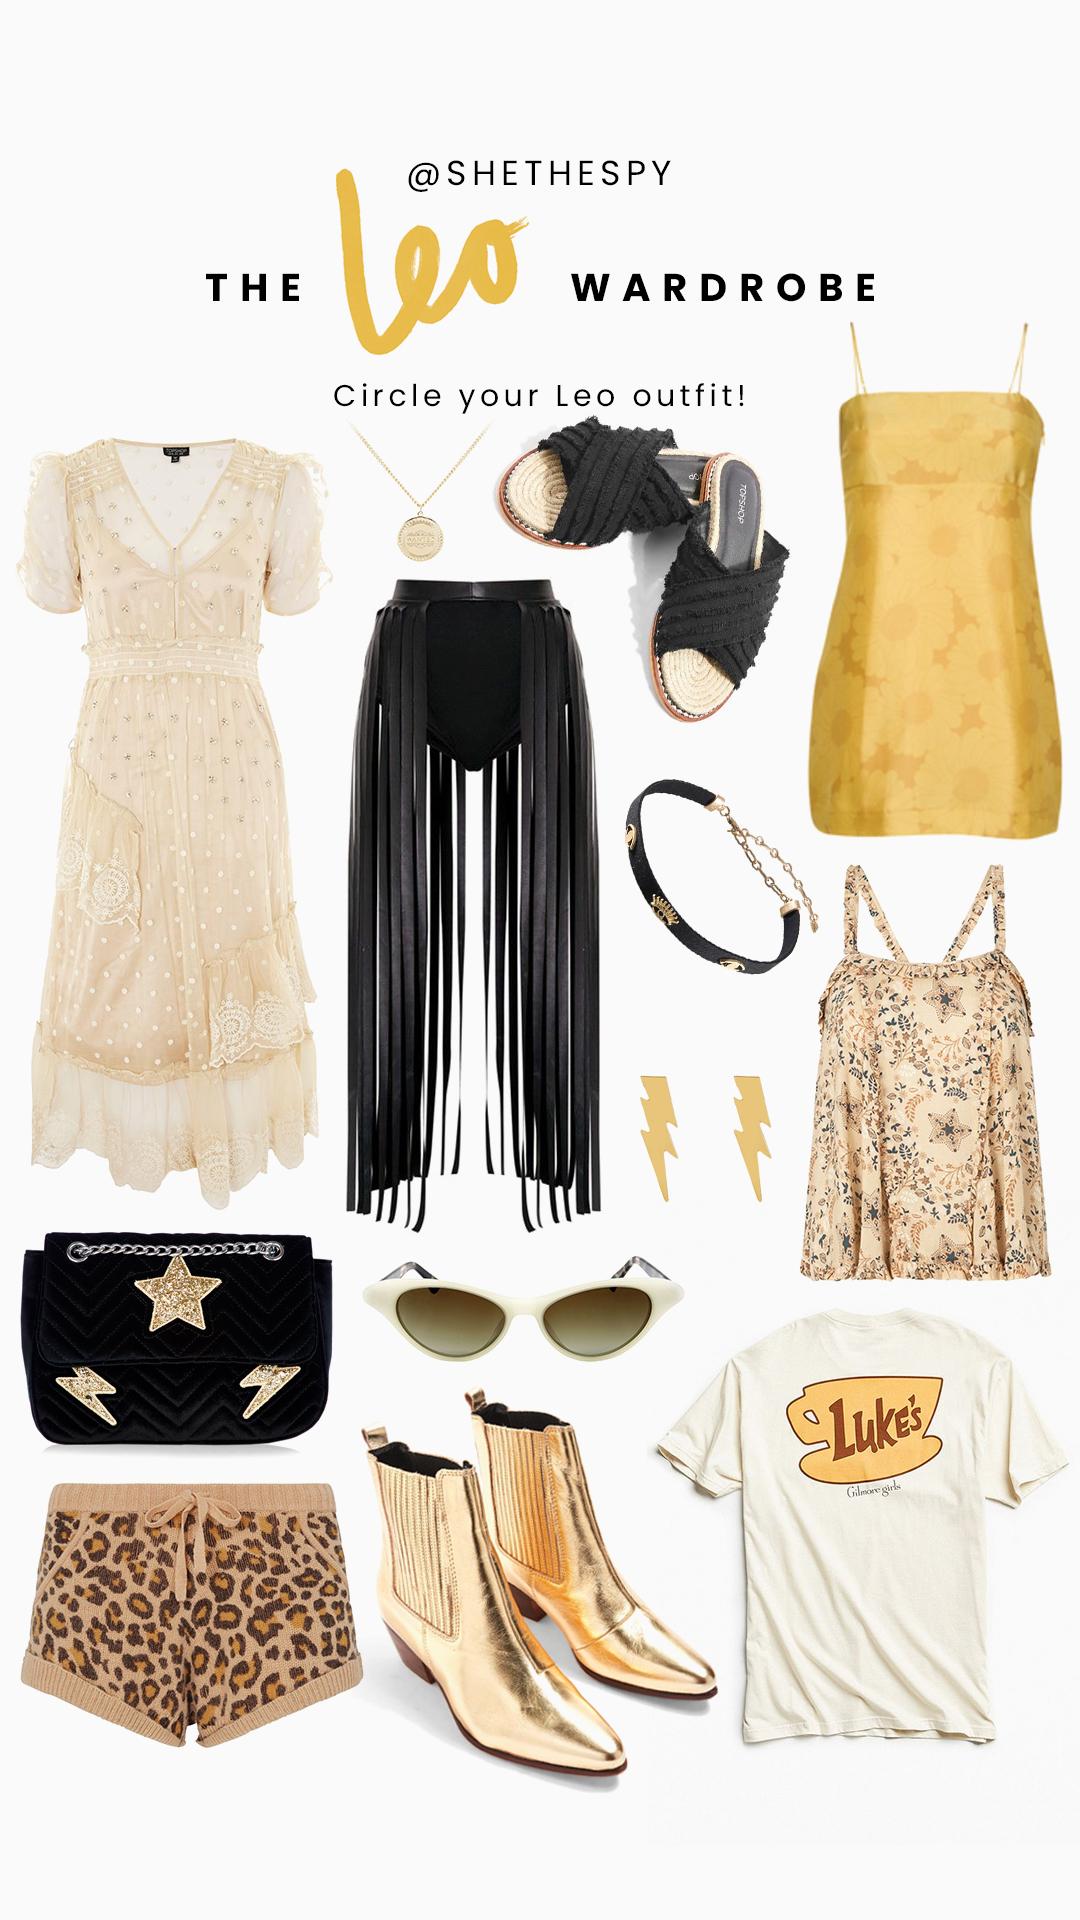 Shop Leo - Cream dress: TopshopNecklace: Skinny DipSlides: TopshopYellow dress: Realisation ParSkirt: Similar from Beginning BoutiqueChoker:UnknownEarrings: Skinny DipBag: Skinny DipSunglasses: ShevokeBoots: TopshopPrinted top: SpellShorts: SpellTee: Urban Outfitters